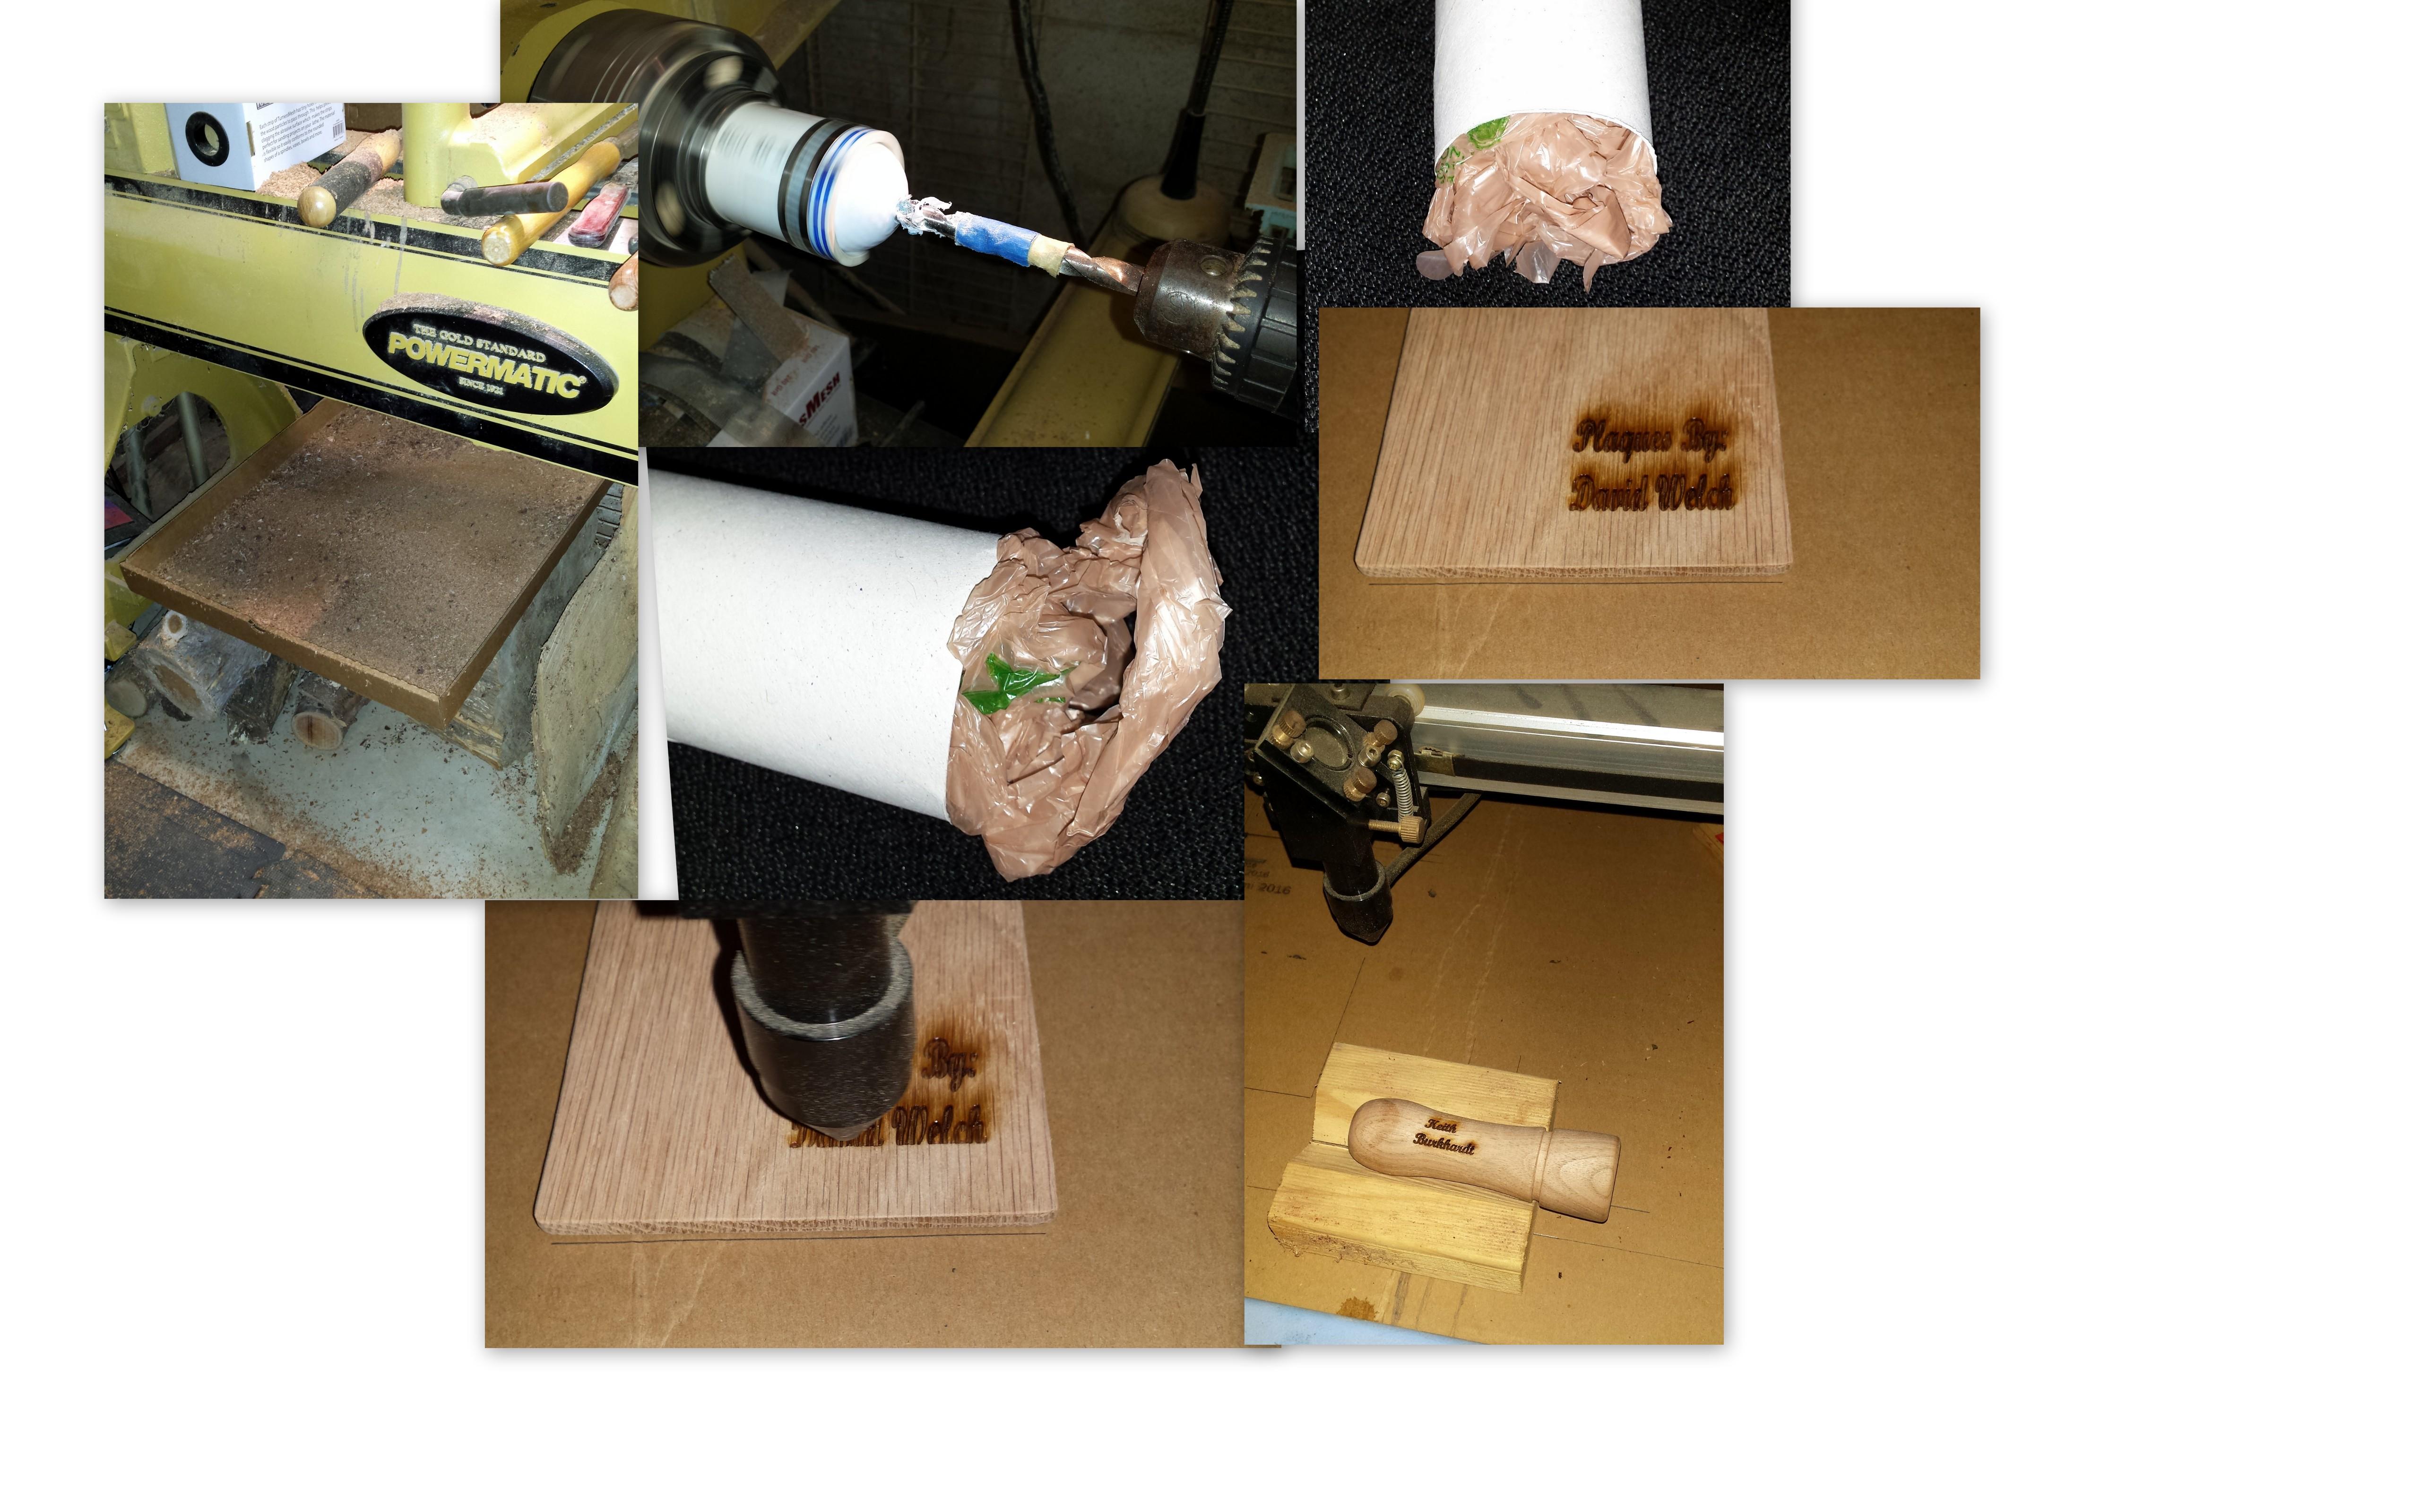 Picture of Five Cardboard Hacks - Woodworking & Plastic Bag Storage